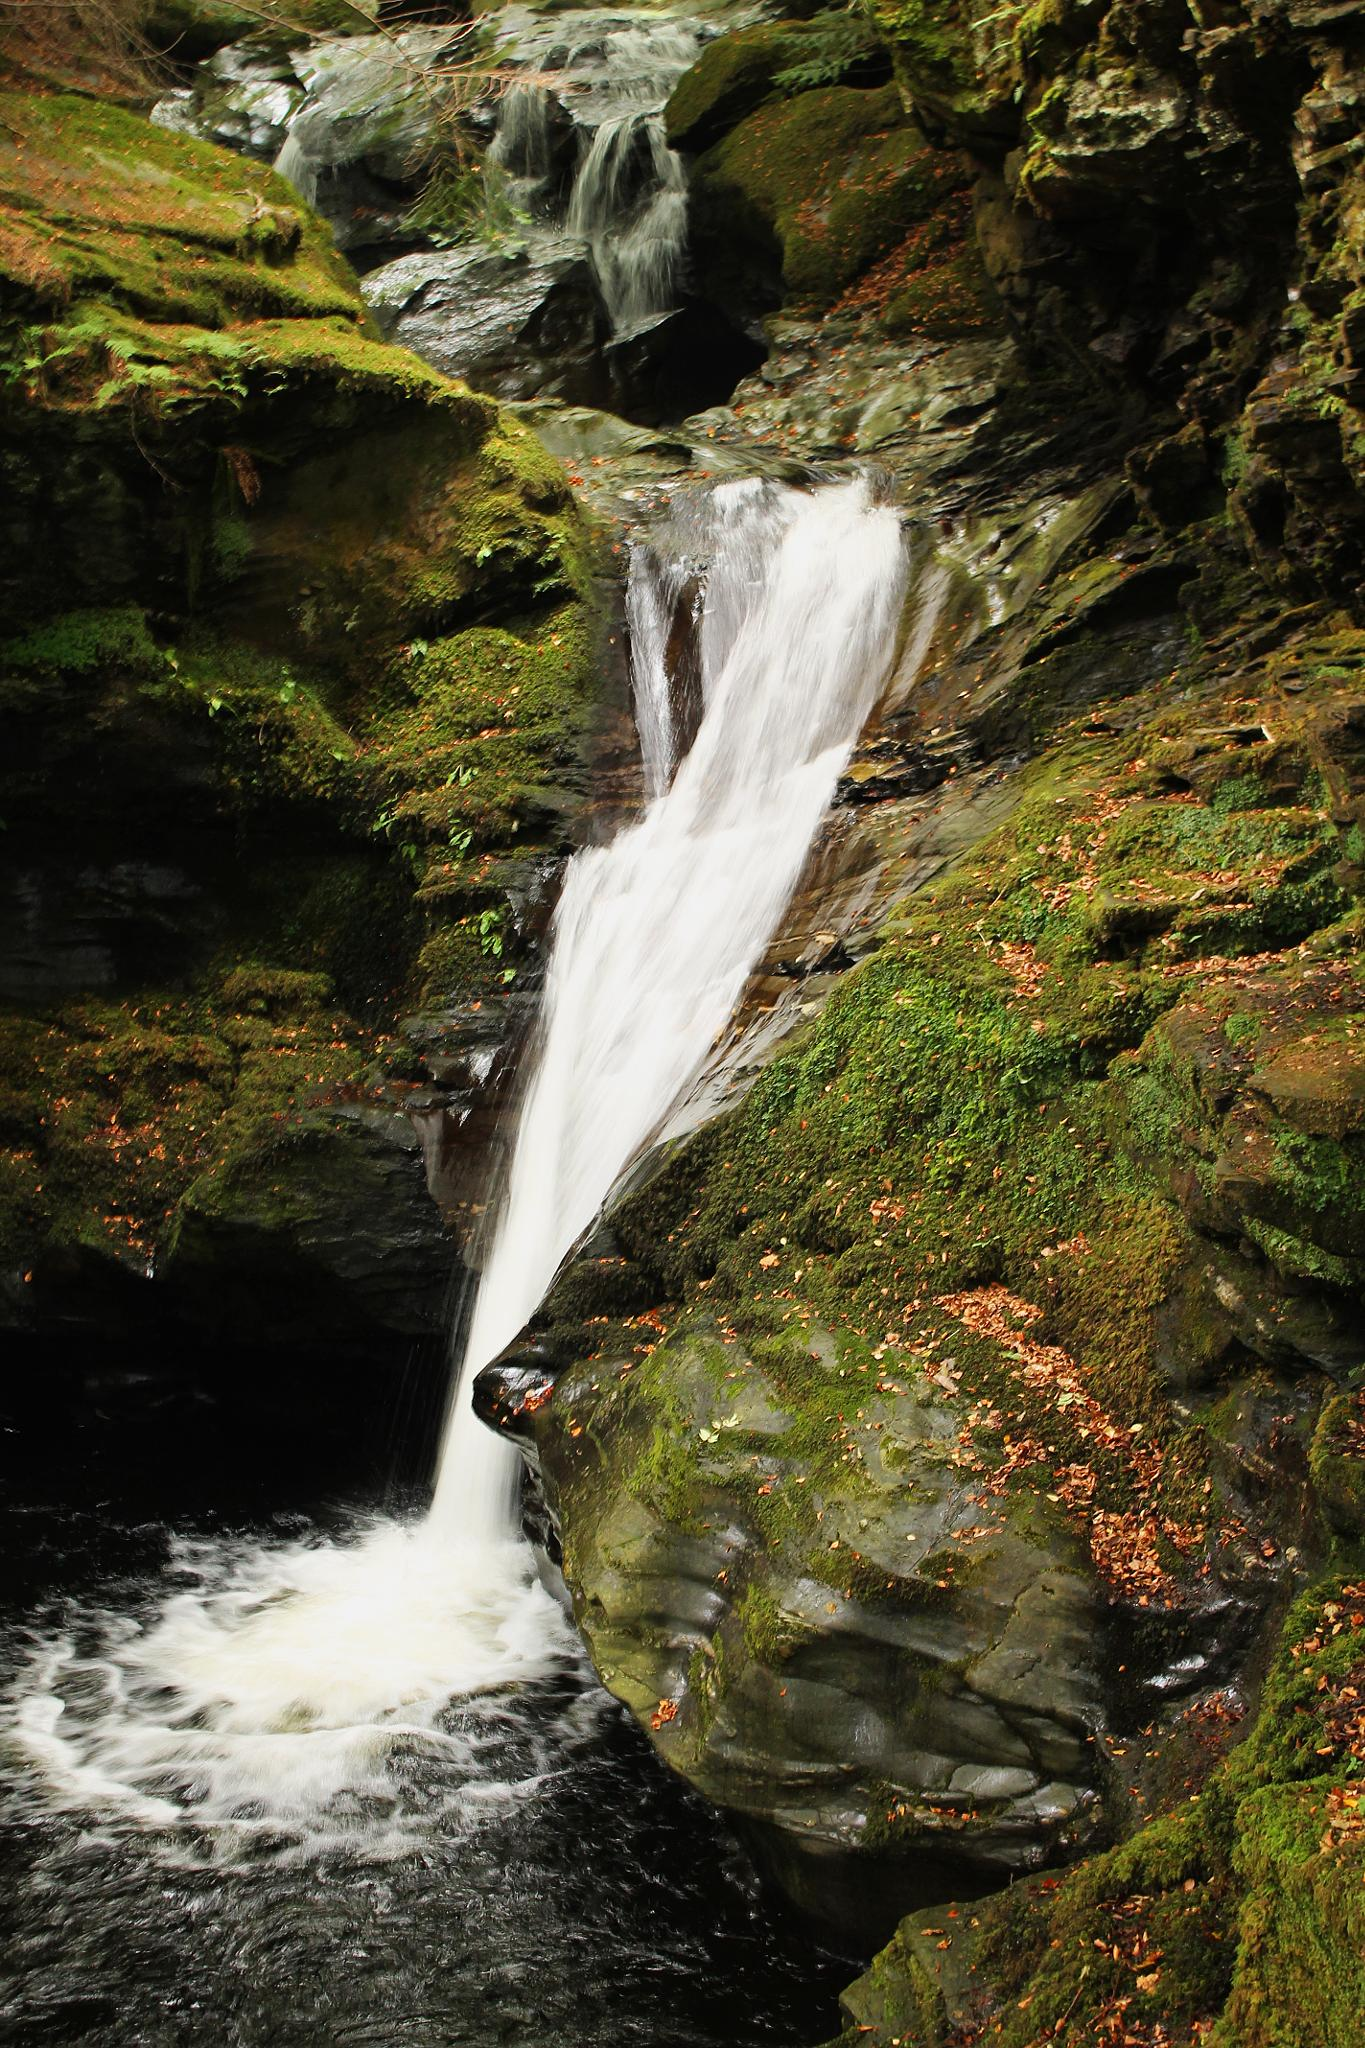 Slow Shutter Waterfall by Steven Ritchie